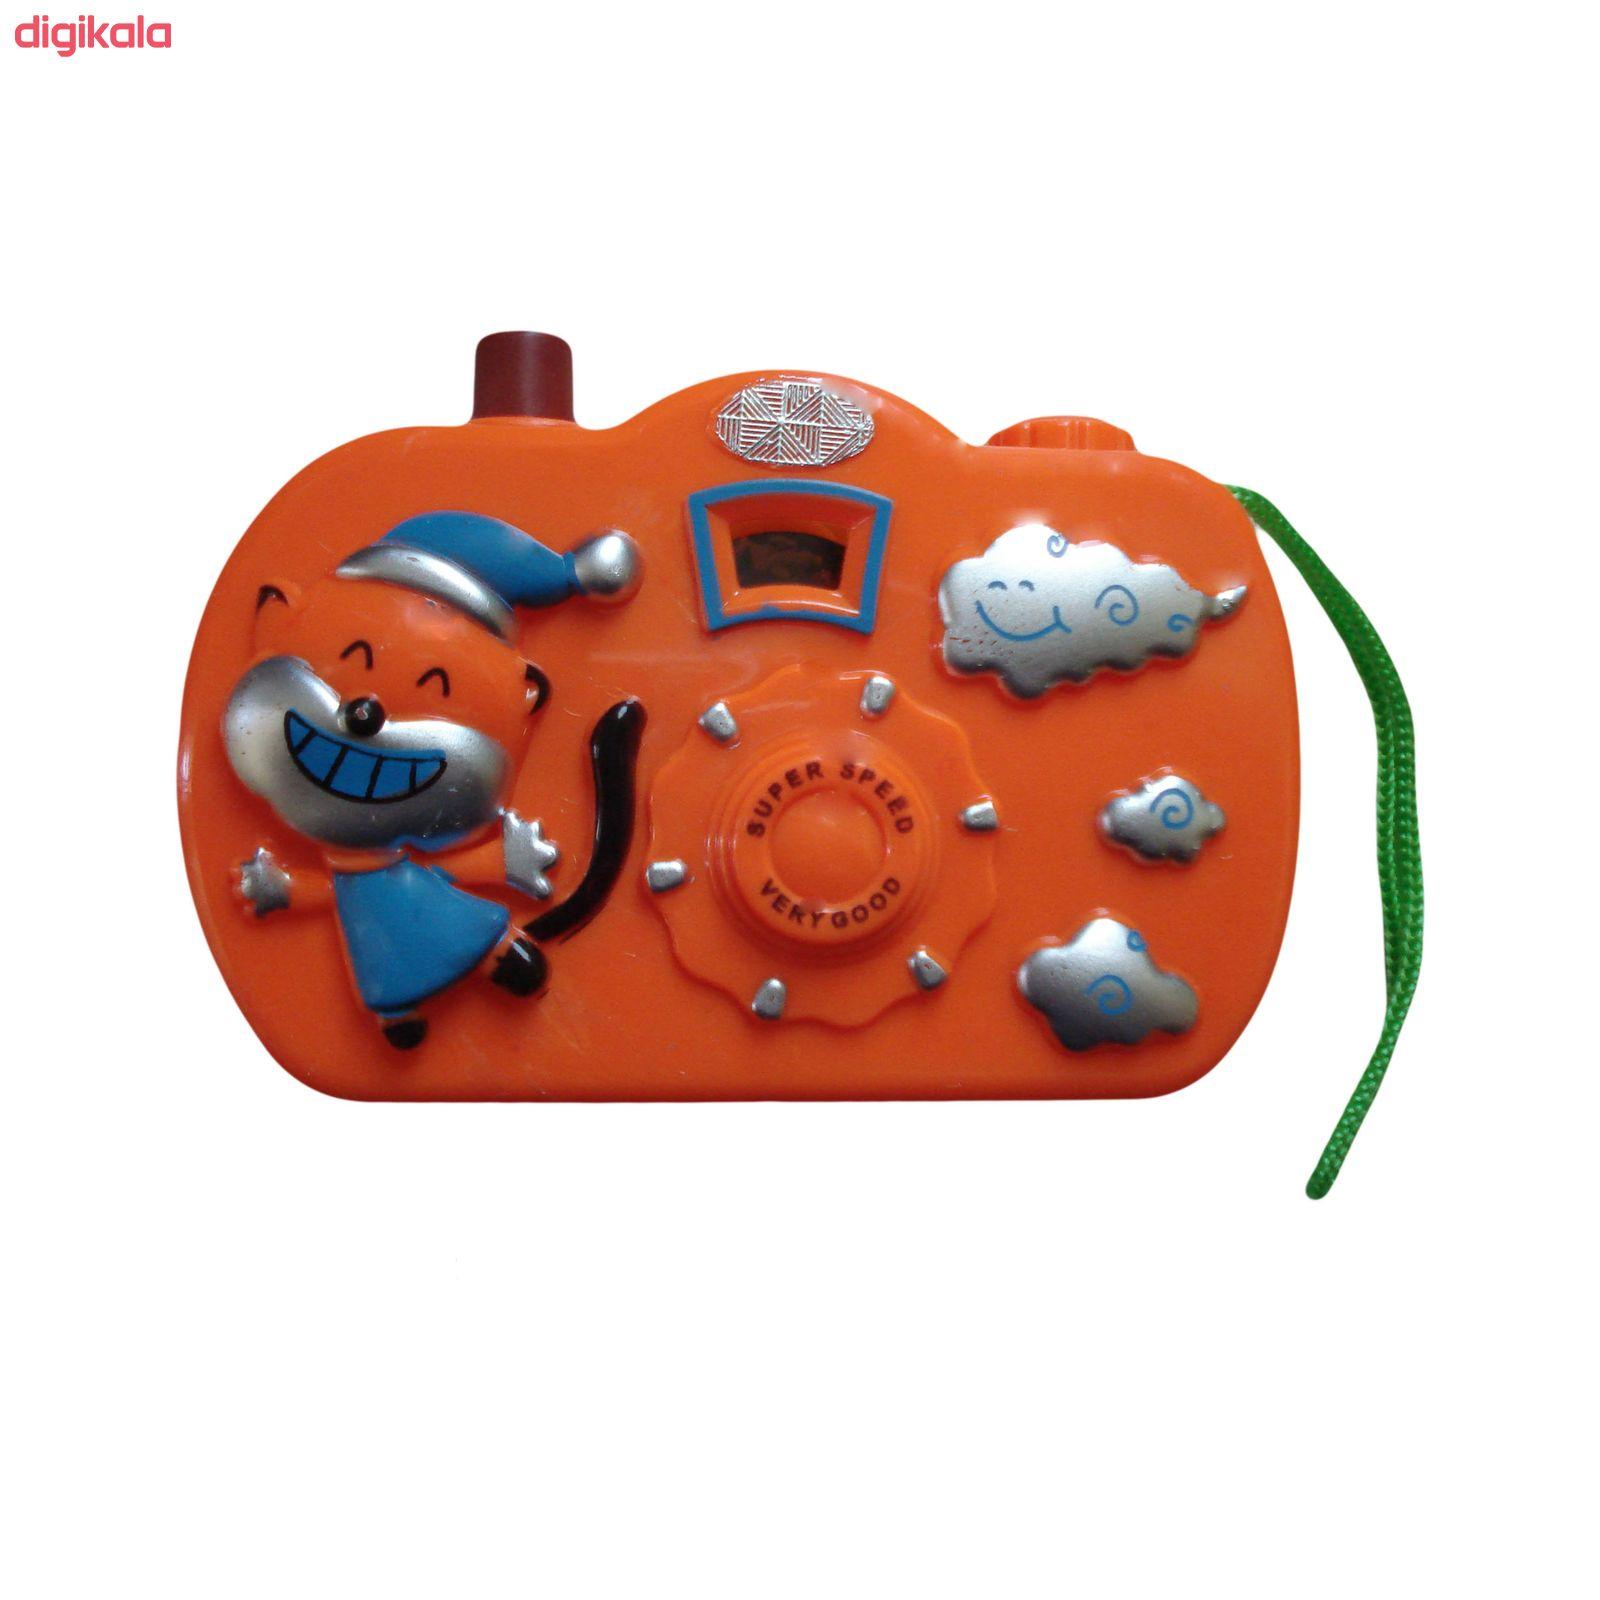 اسباب بازی دوربین عکاسی مدل cat کد GB-1000  main 1 1